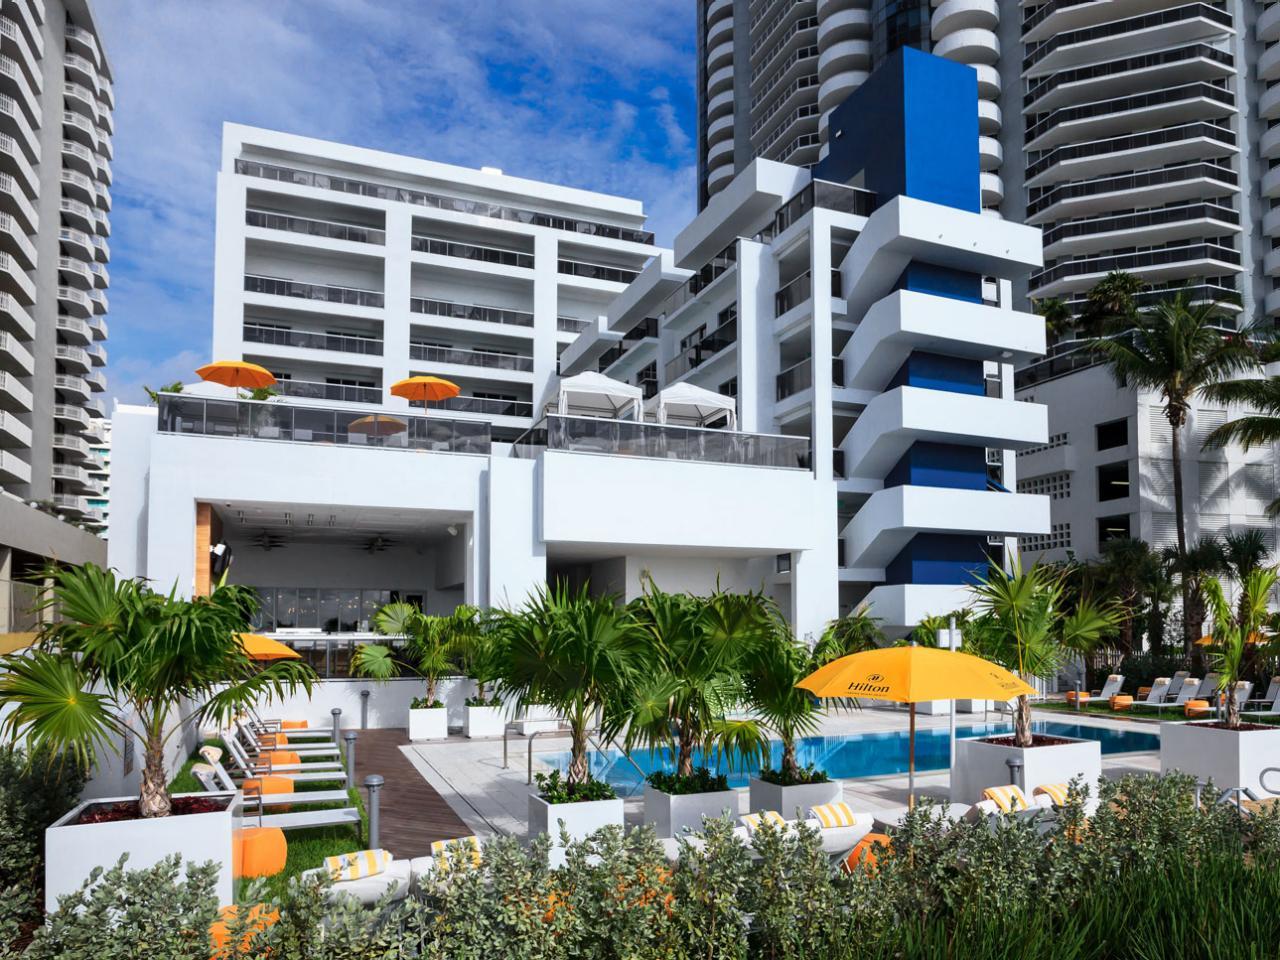 Sanibel Island Hotels: Samantha Brown's Miami Hot Spots : Miami, FL